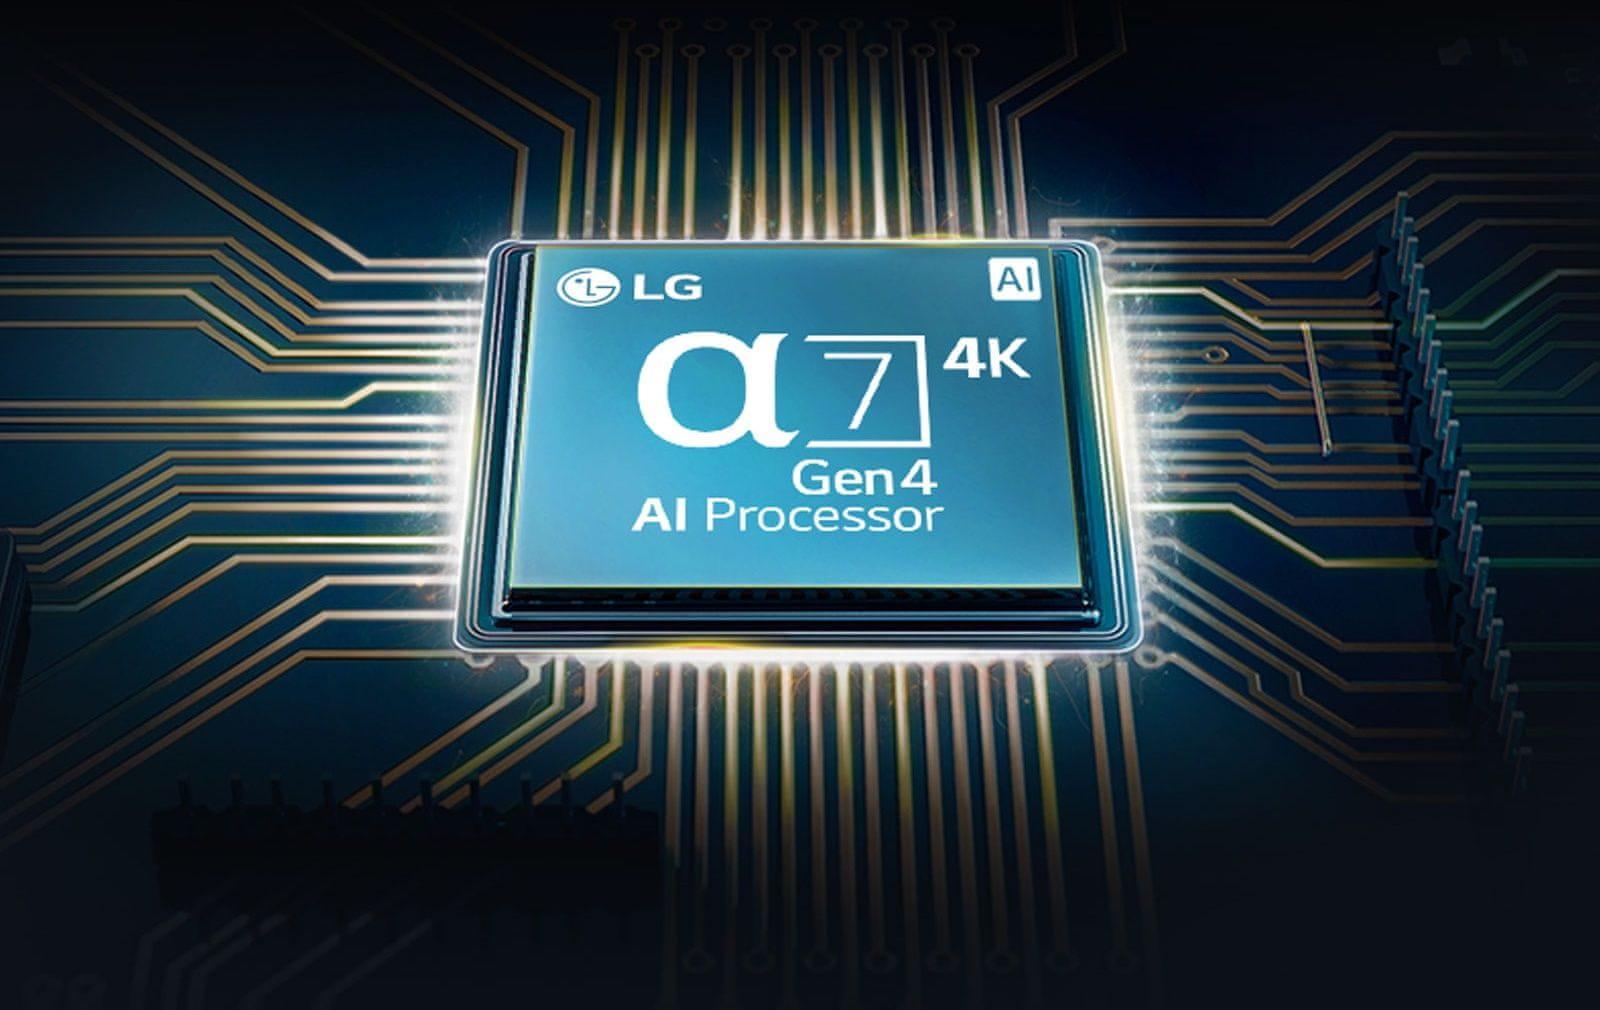 LG TV televízor OLED 4K 2021 procesor α7 4K Gen4 AI